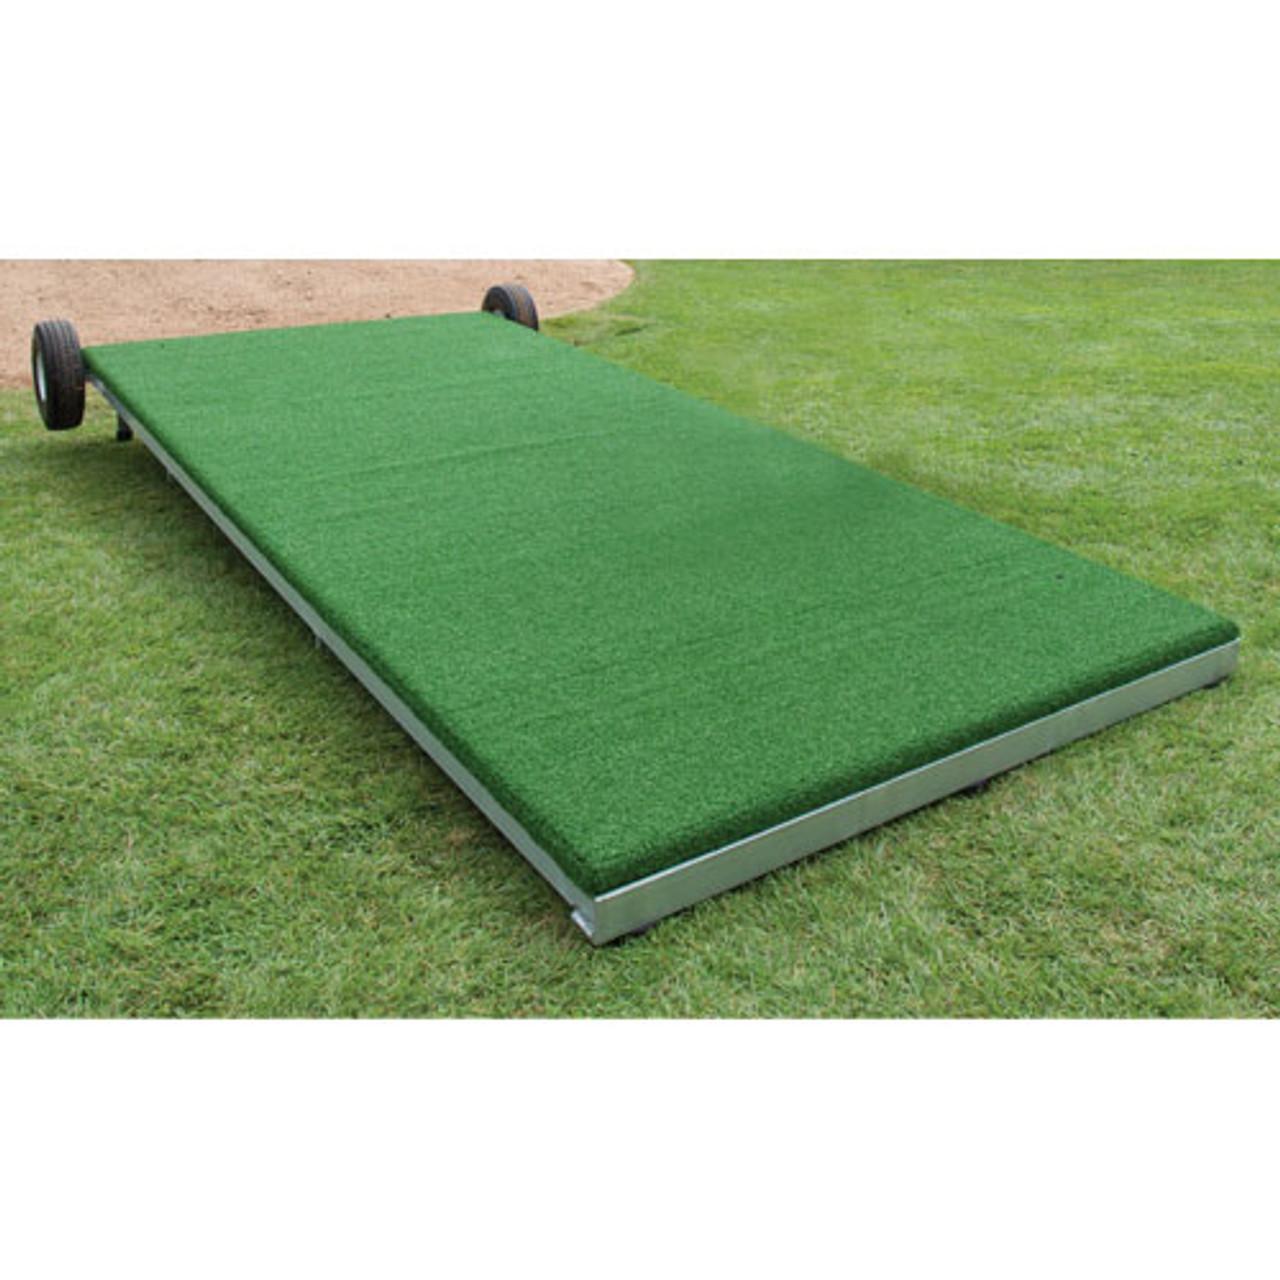 baseball Pitcher's Platform